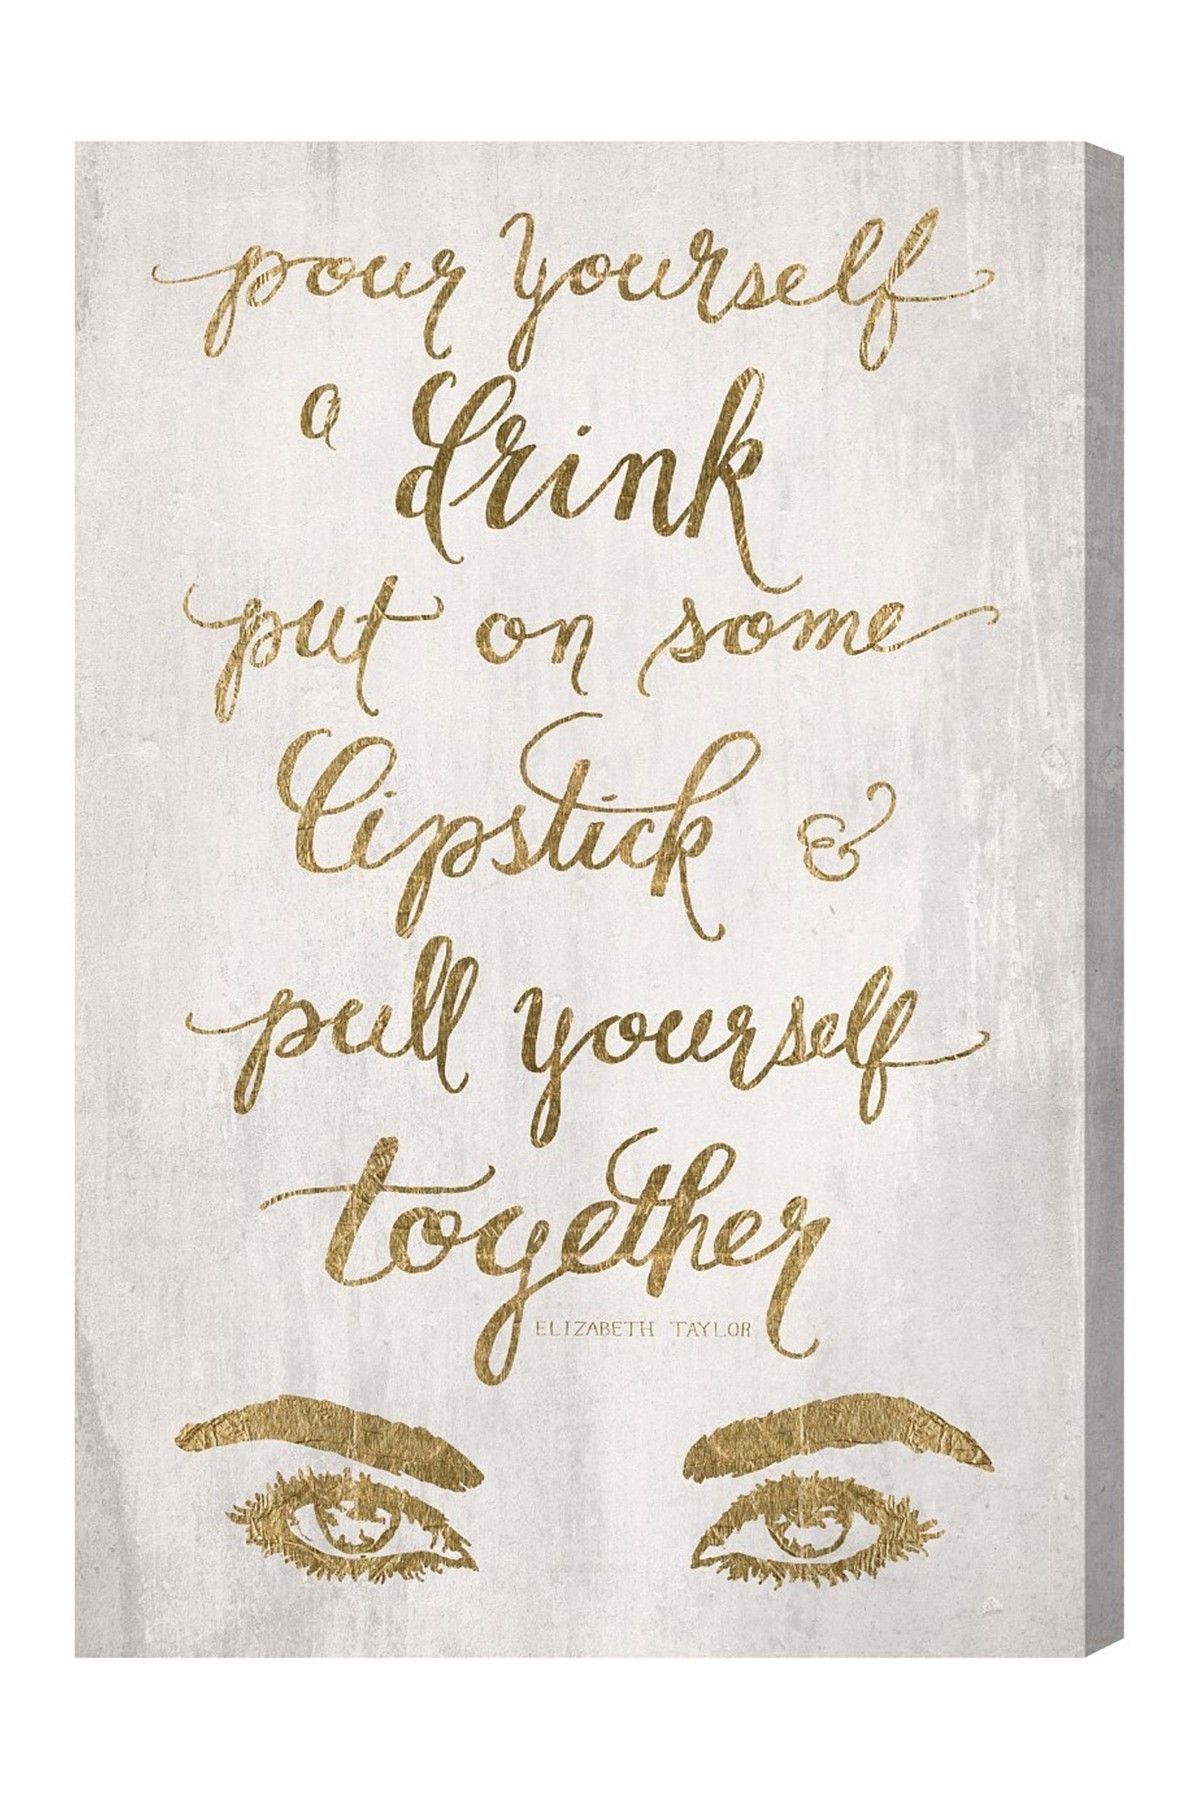 Put on some lipstick gold canvas wall art text pinterest